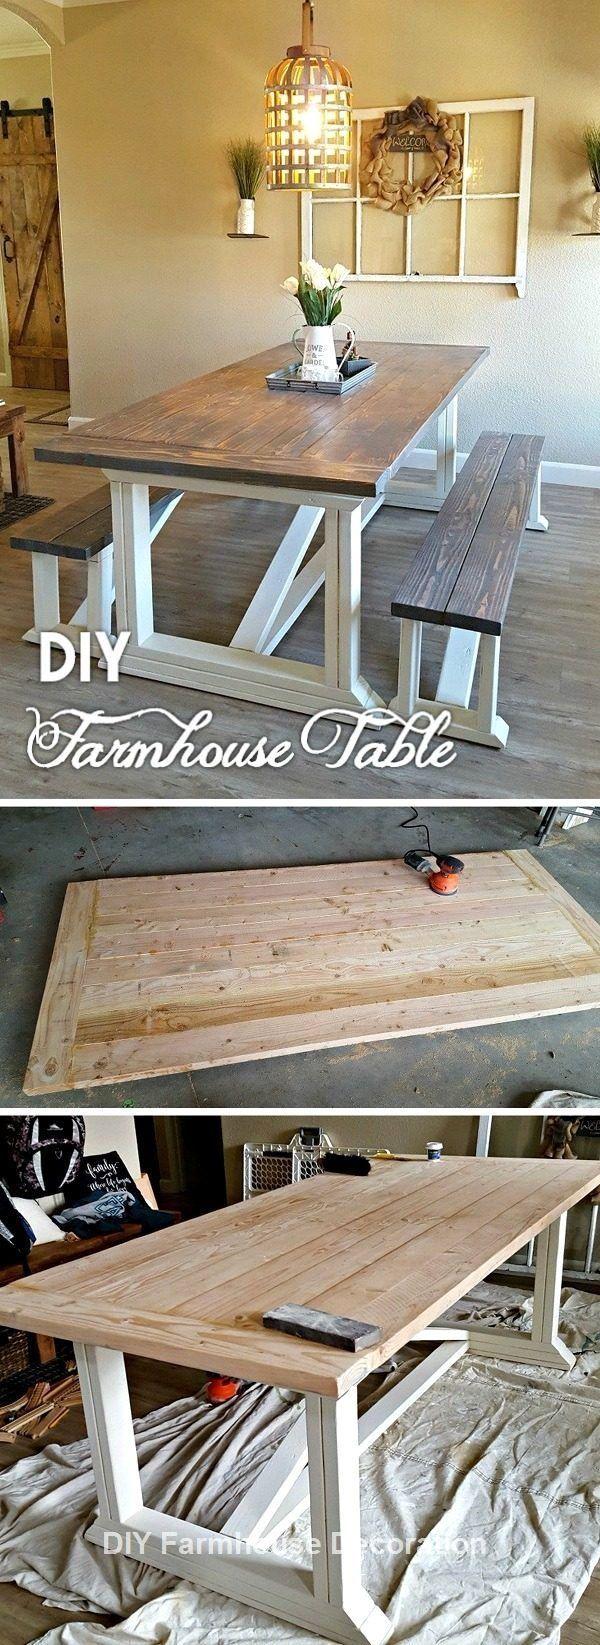 diy easy and great farmhouse decor ideas diyhomedecor farmhouse dining room table farmhouse on farmhouse kitchen table diy id=70749